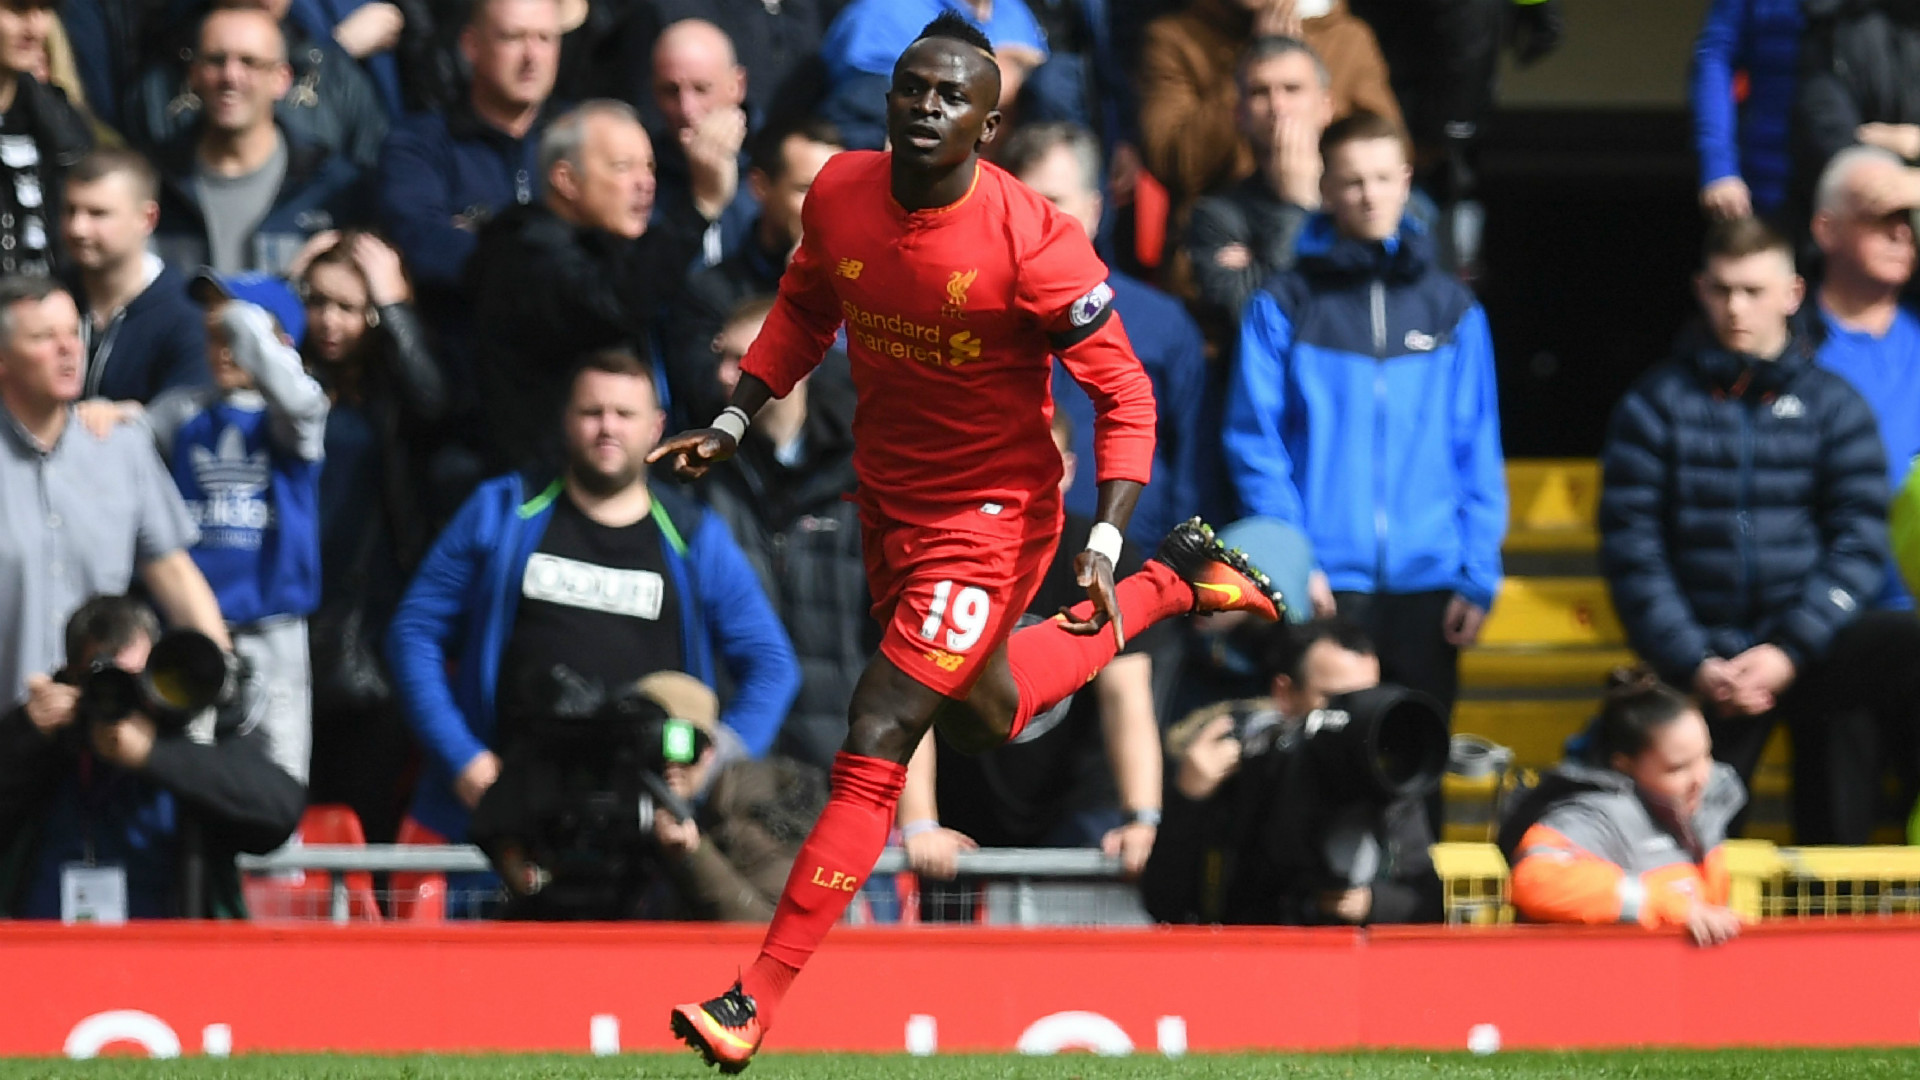 HD Sadio Mane Liverpool celebrate